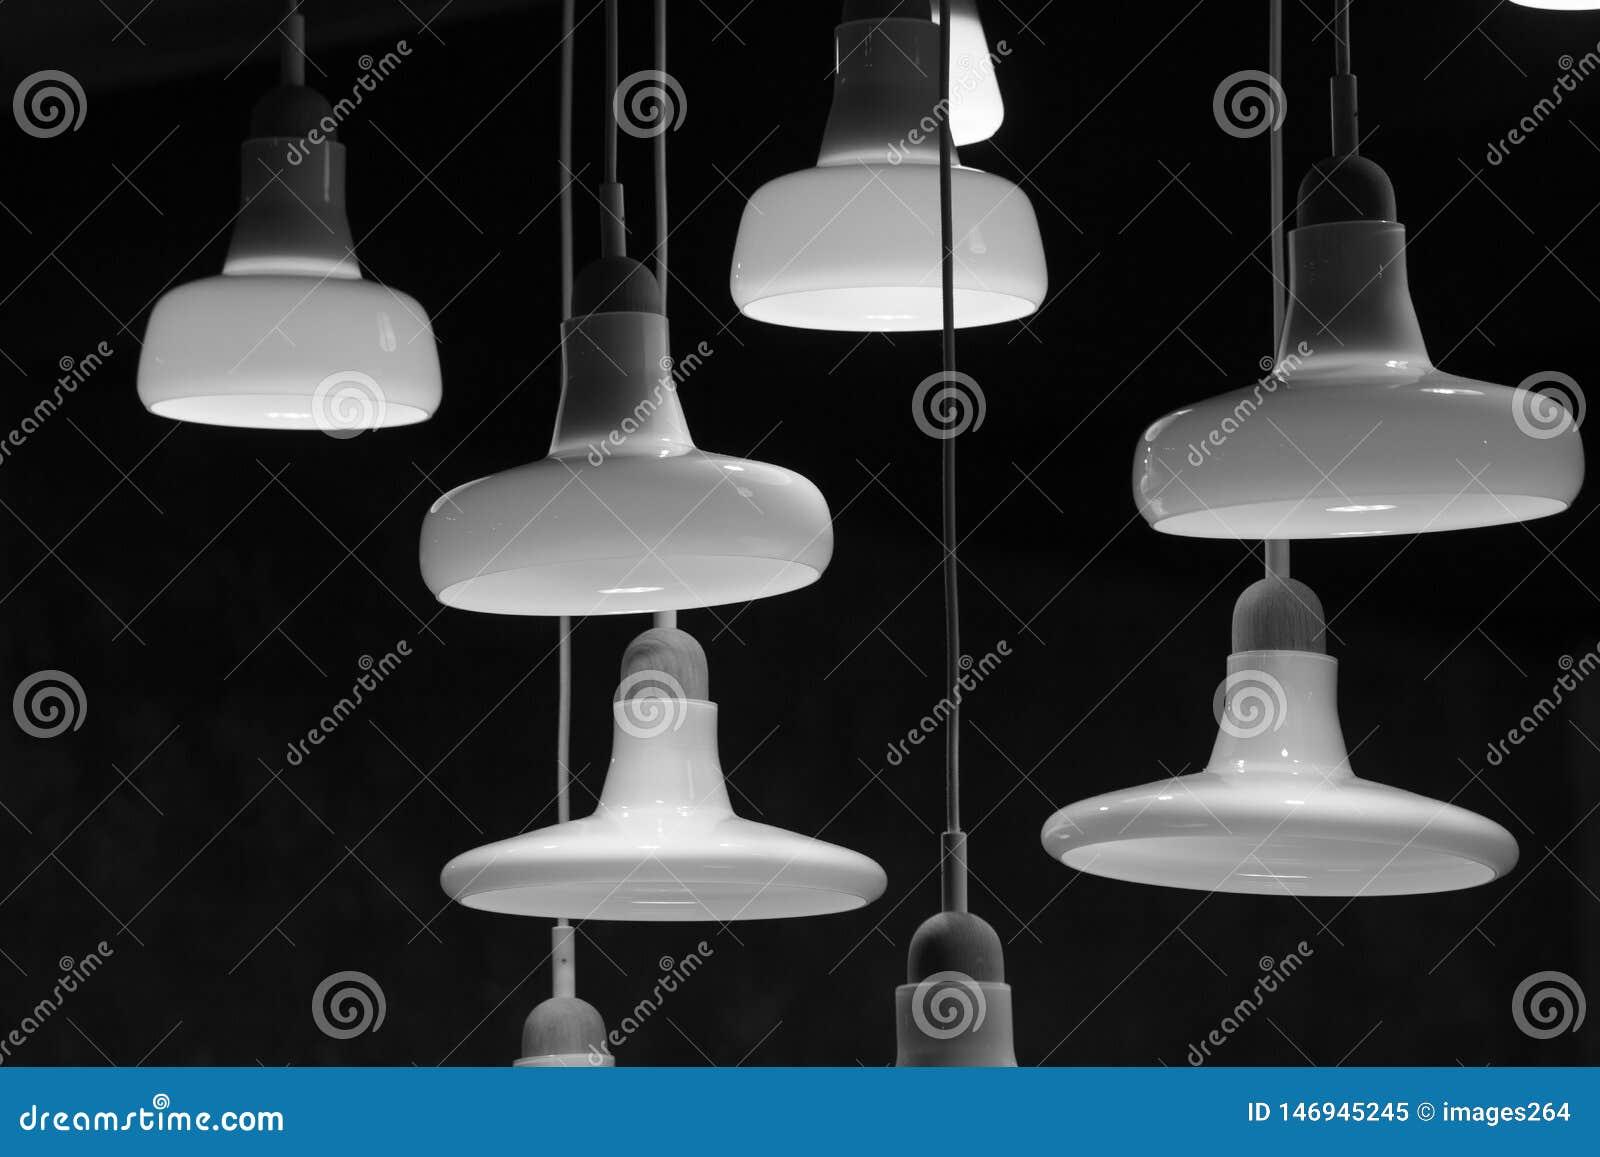 Various illuminated lamps